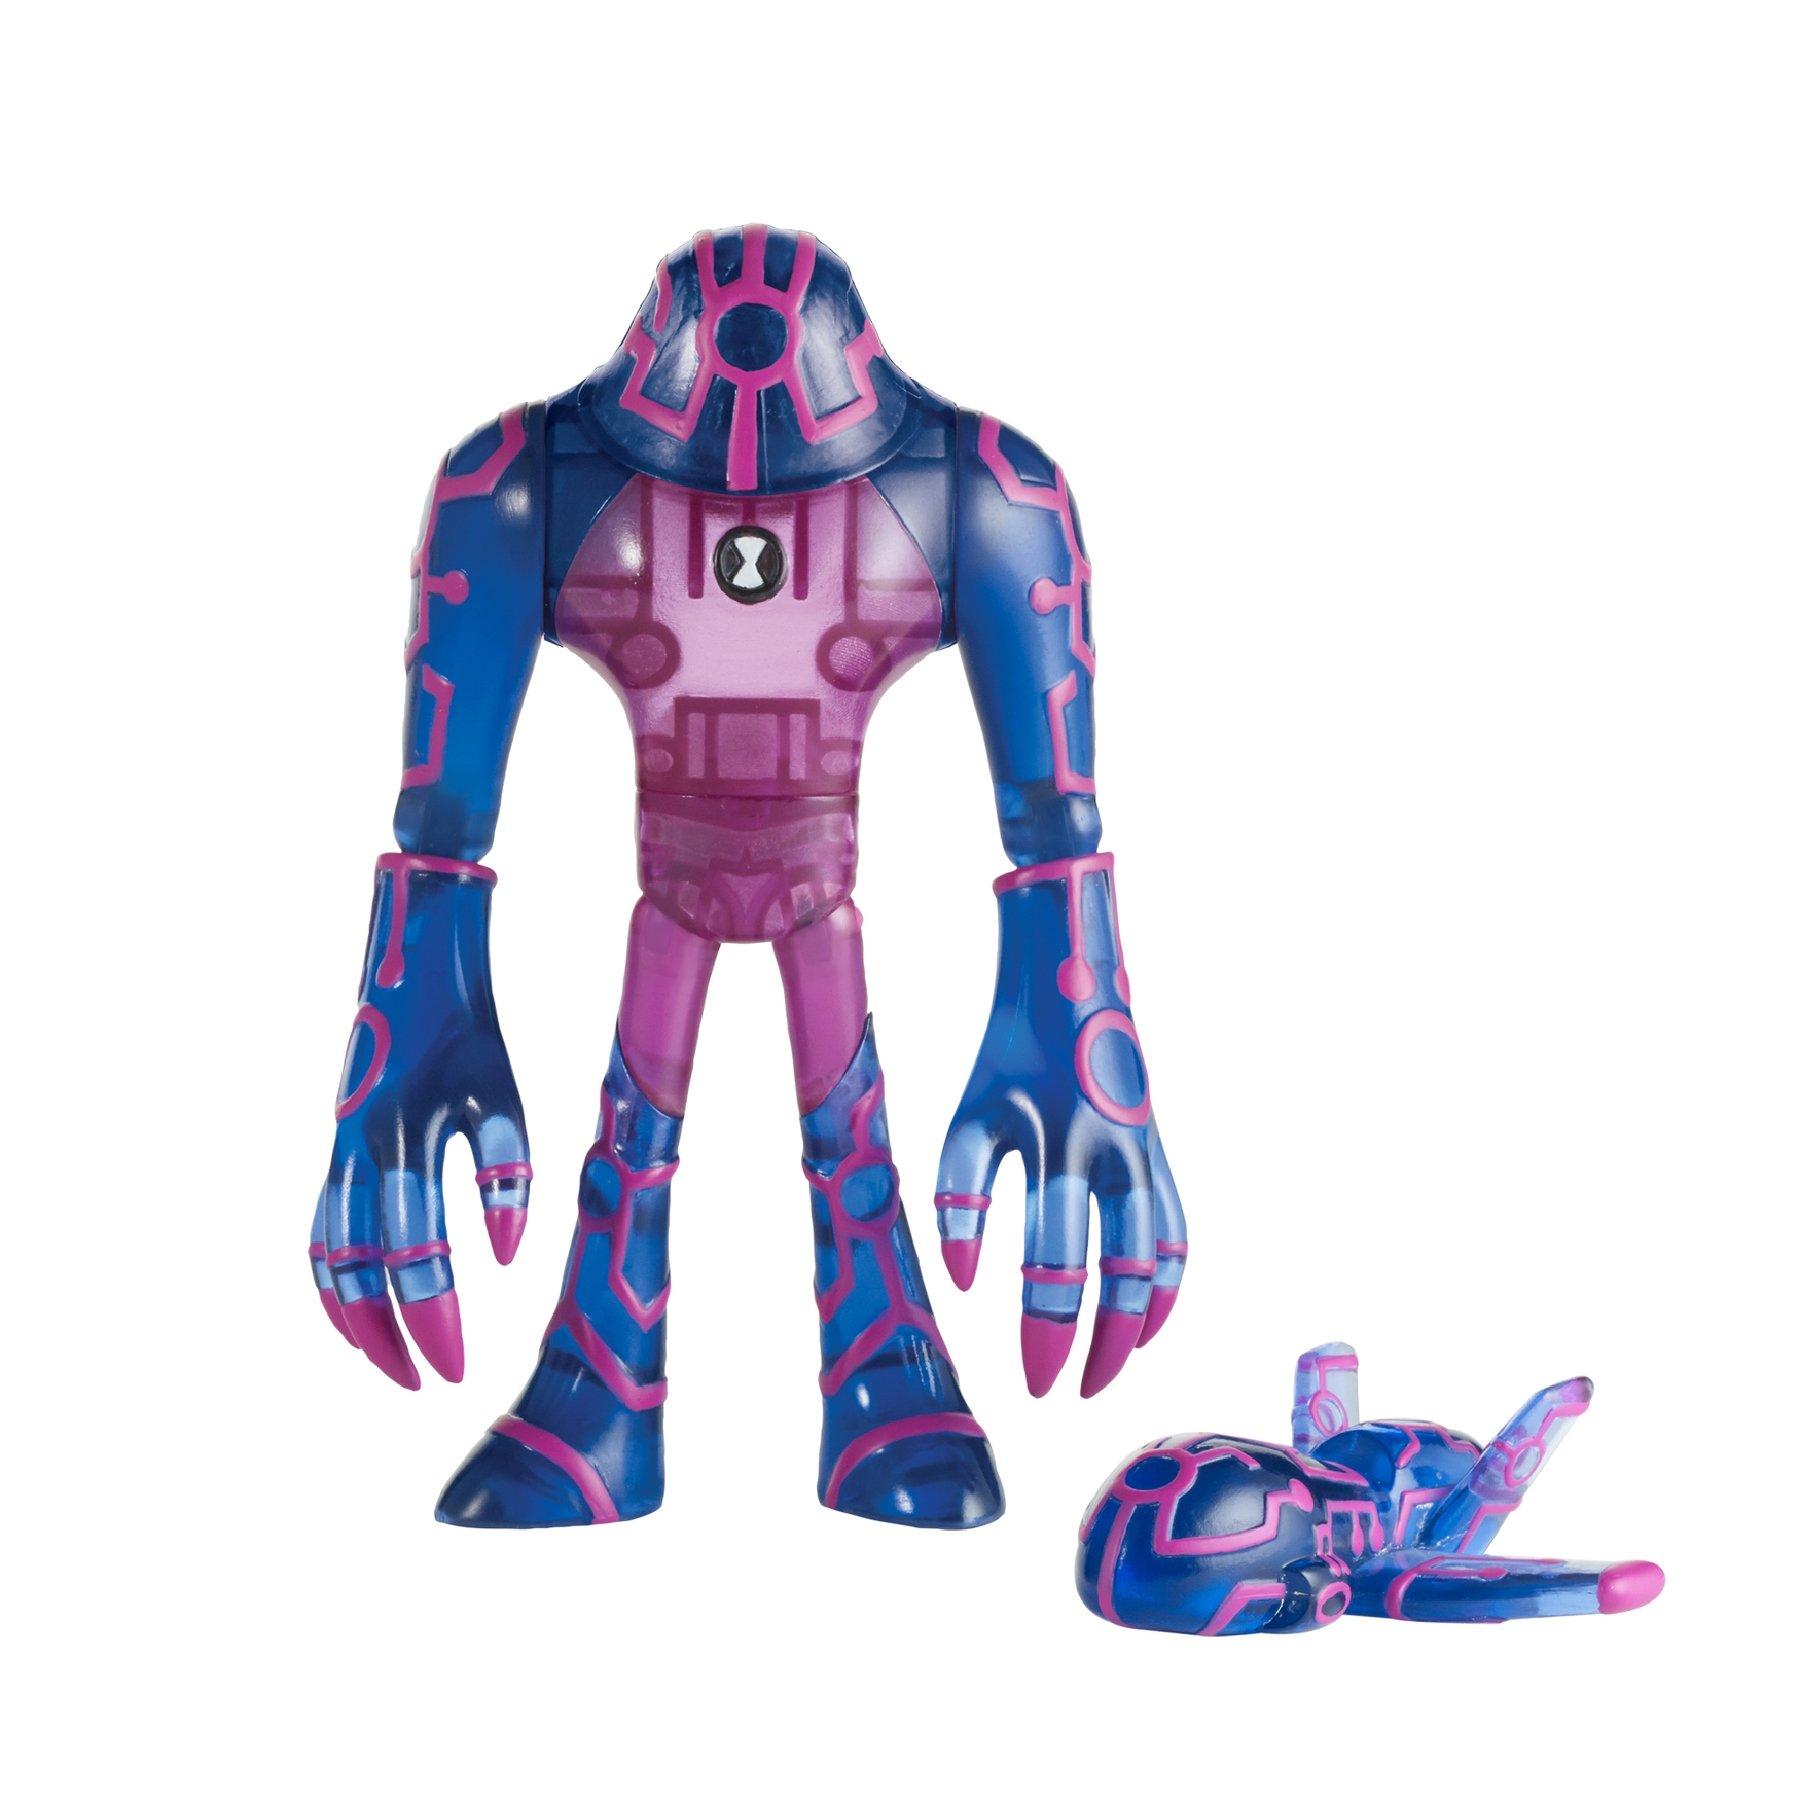 Amazon.com: ben 10 toys